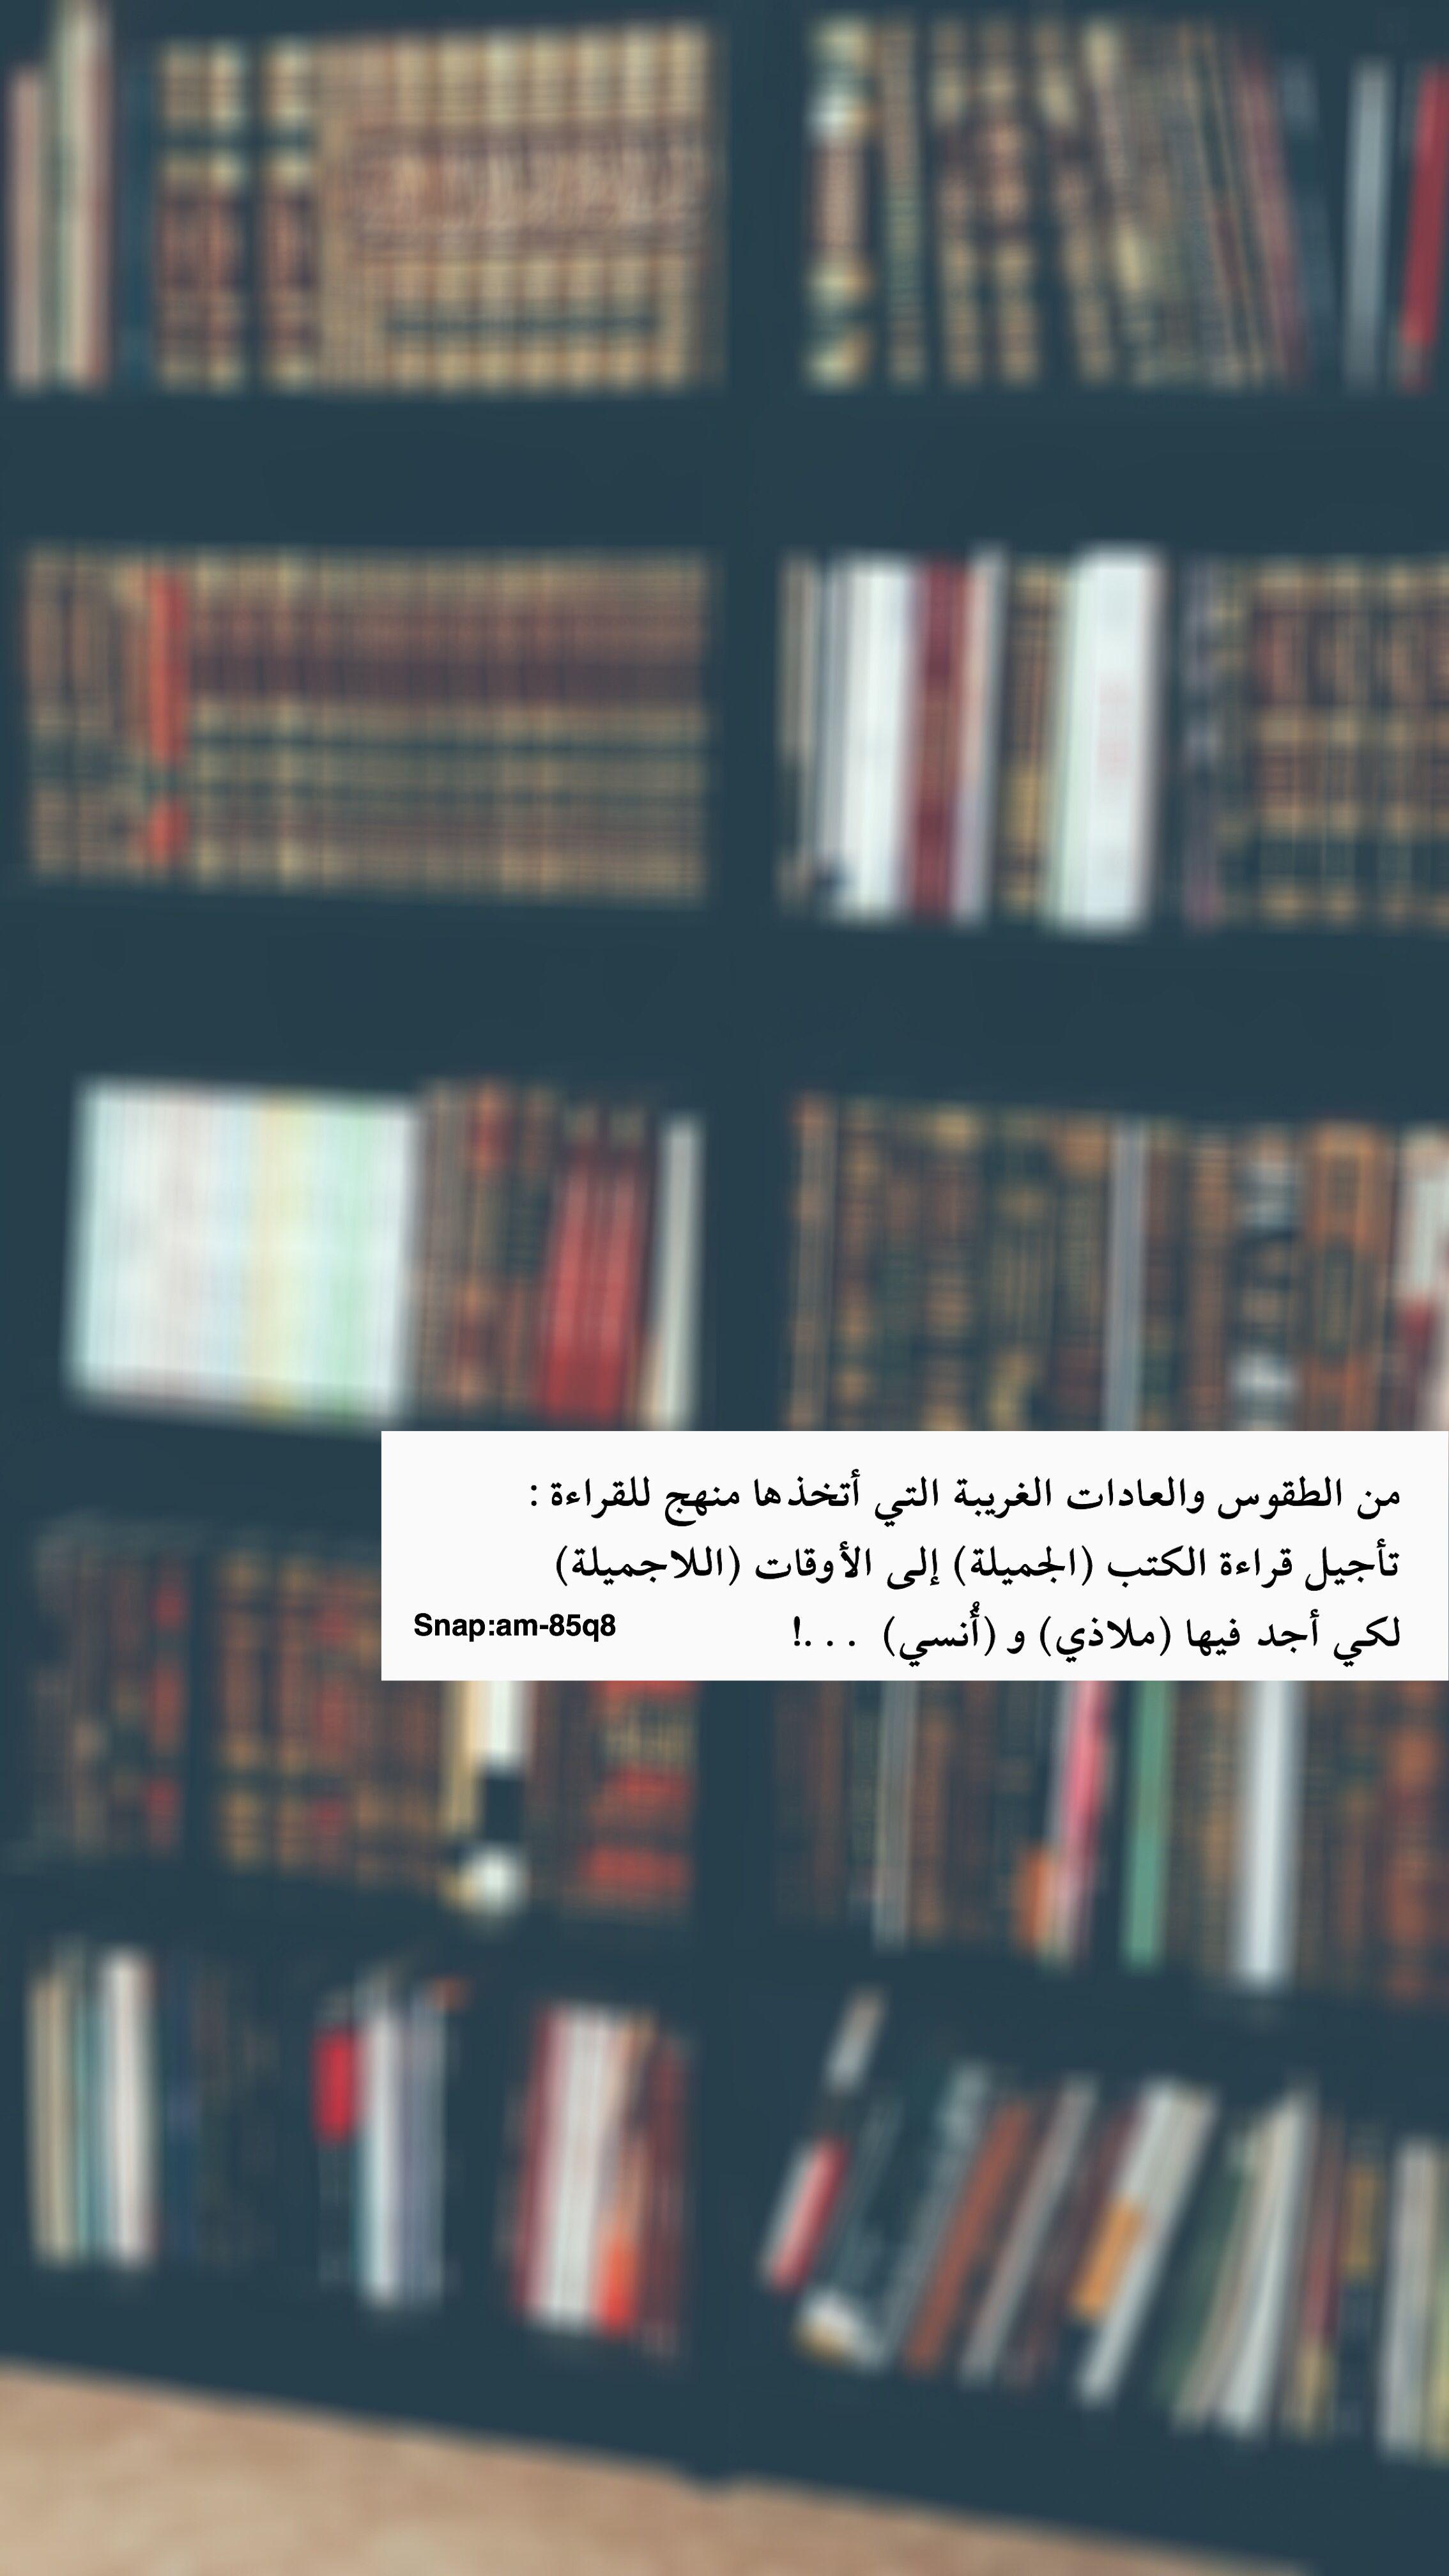 كتب مكتبة Books Quotes كل هالدنيا أماني Snapchat Friendship Quotes Funny Book Quotes Sarcastic Quotes Funny